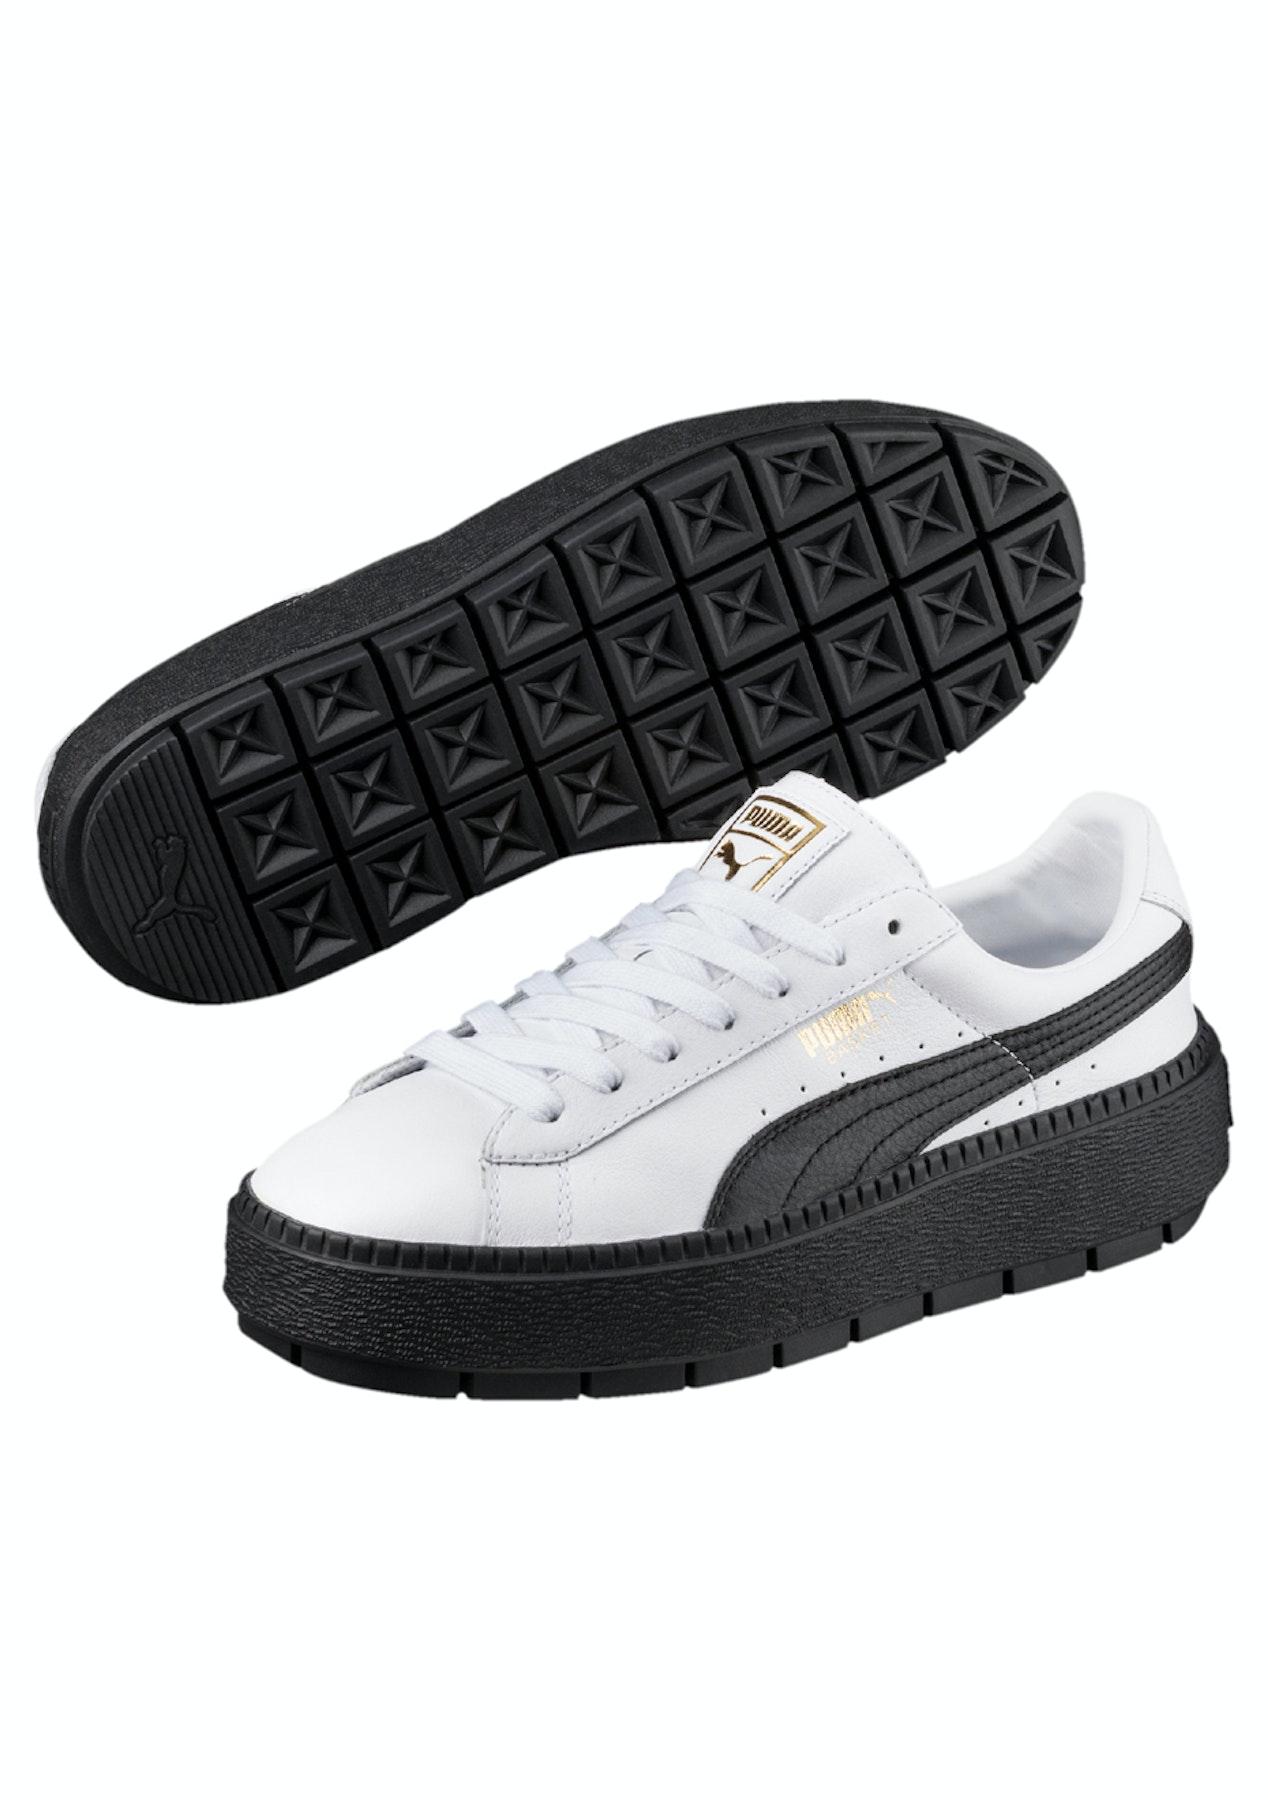 promo code 37f4c 99ac1 Puma Womens - Basket Platform Trace - White - Black